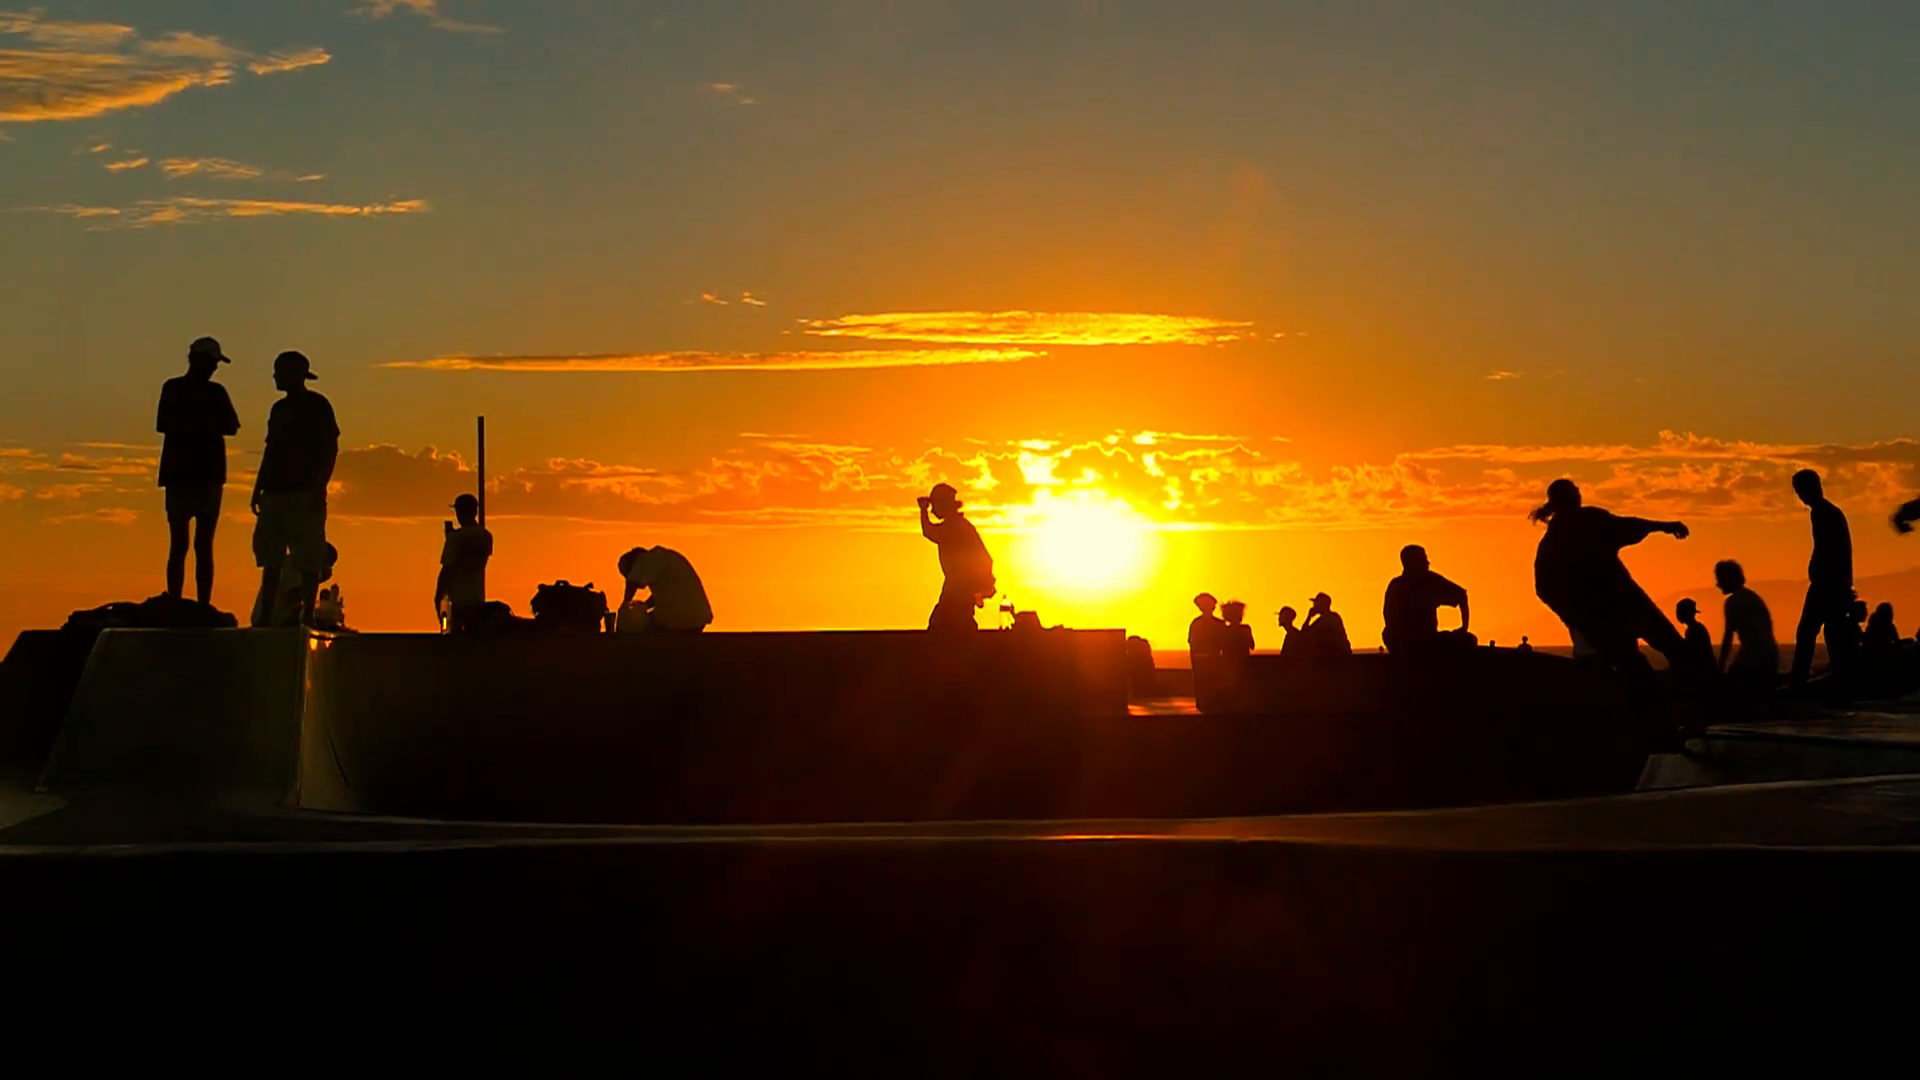 Silhouette Tourists Sunset Skateboarding Extreme Skatepark Enjoyment ...